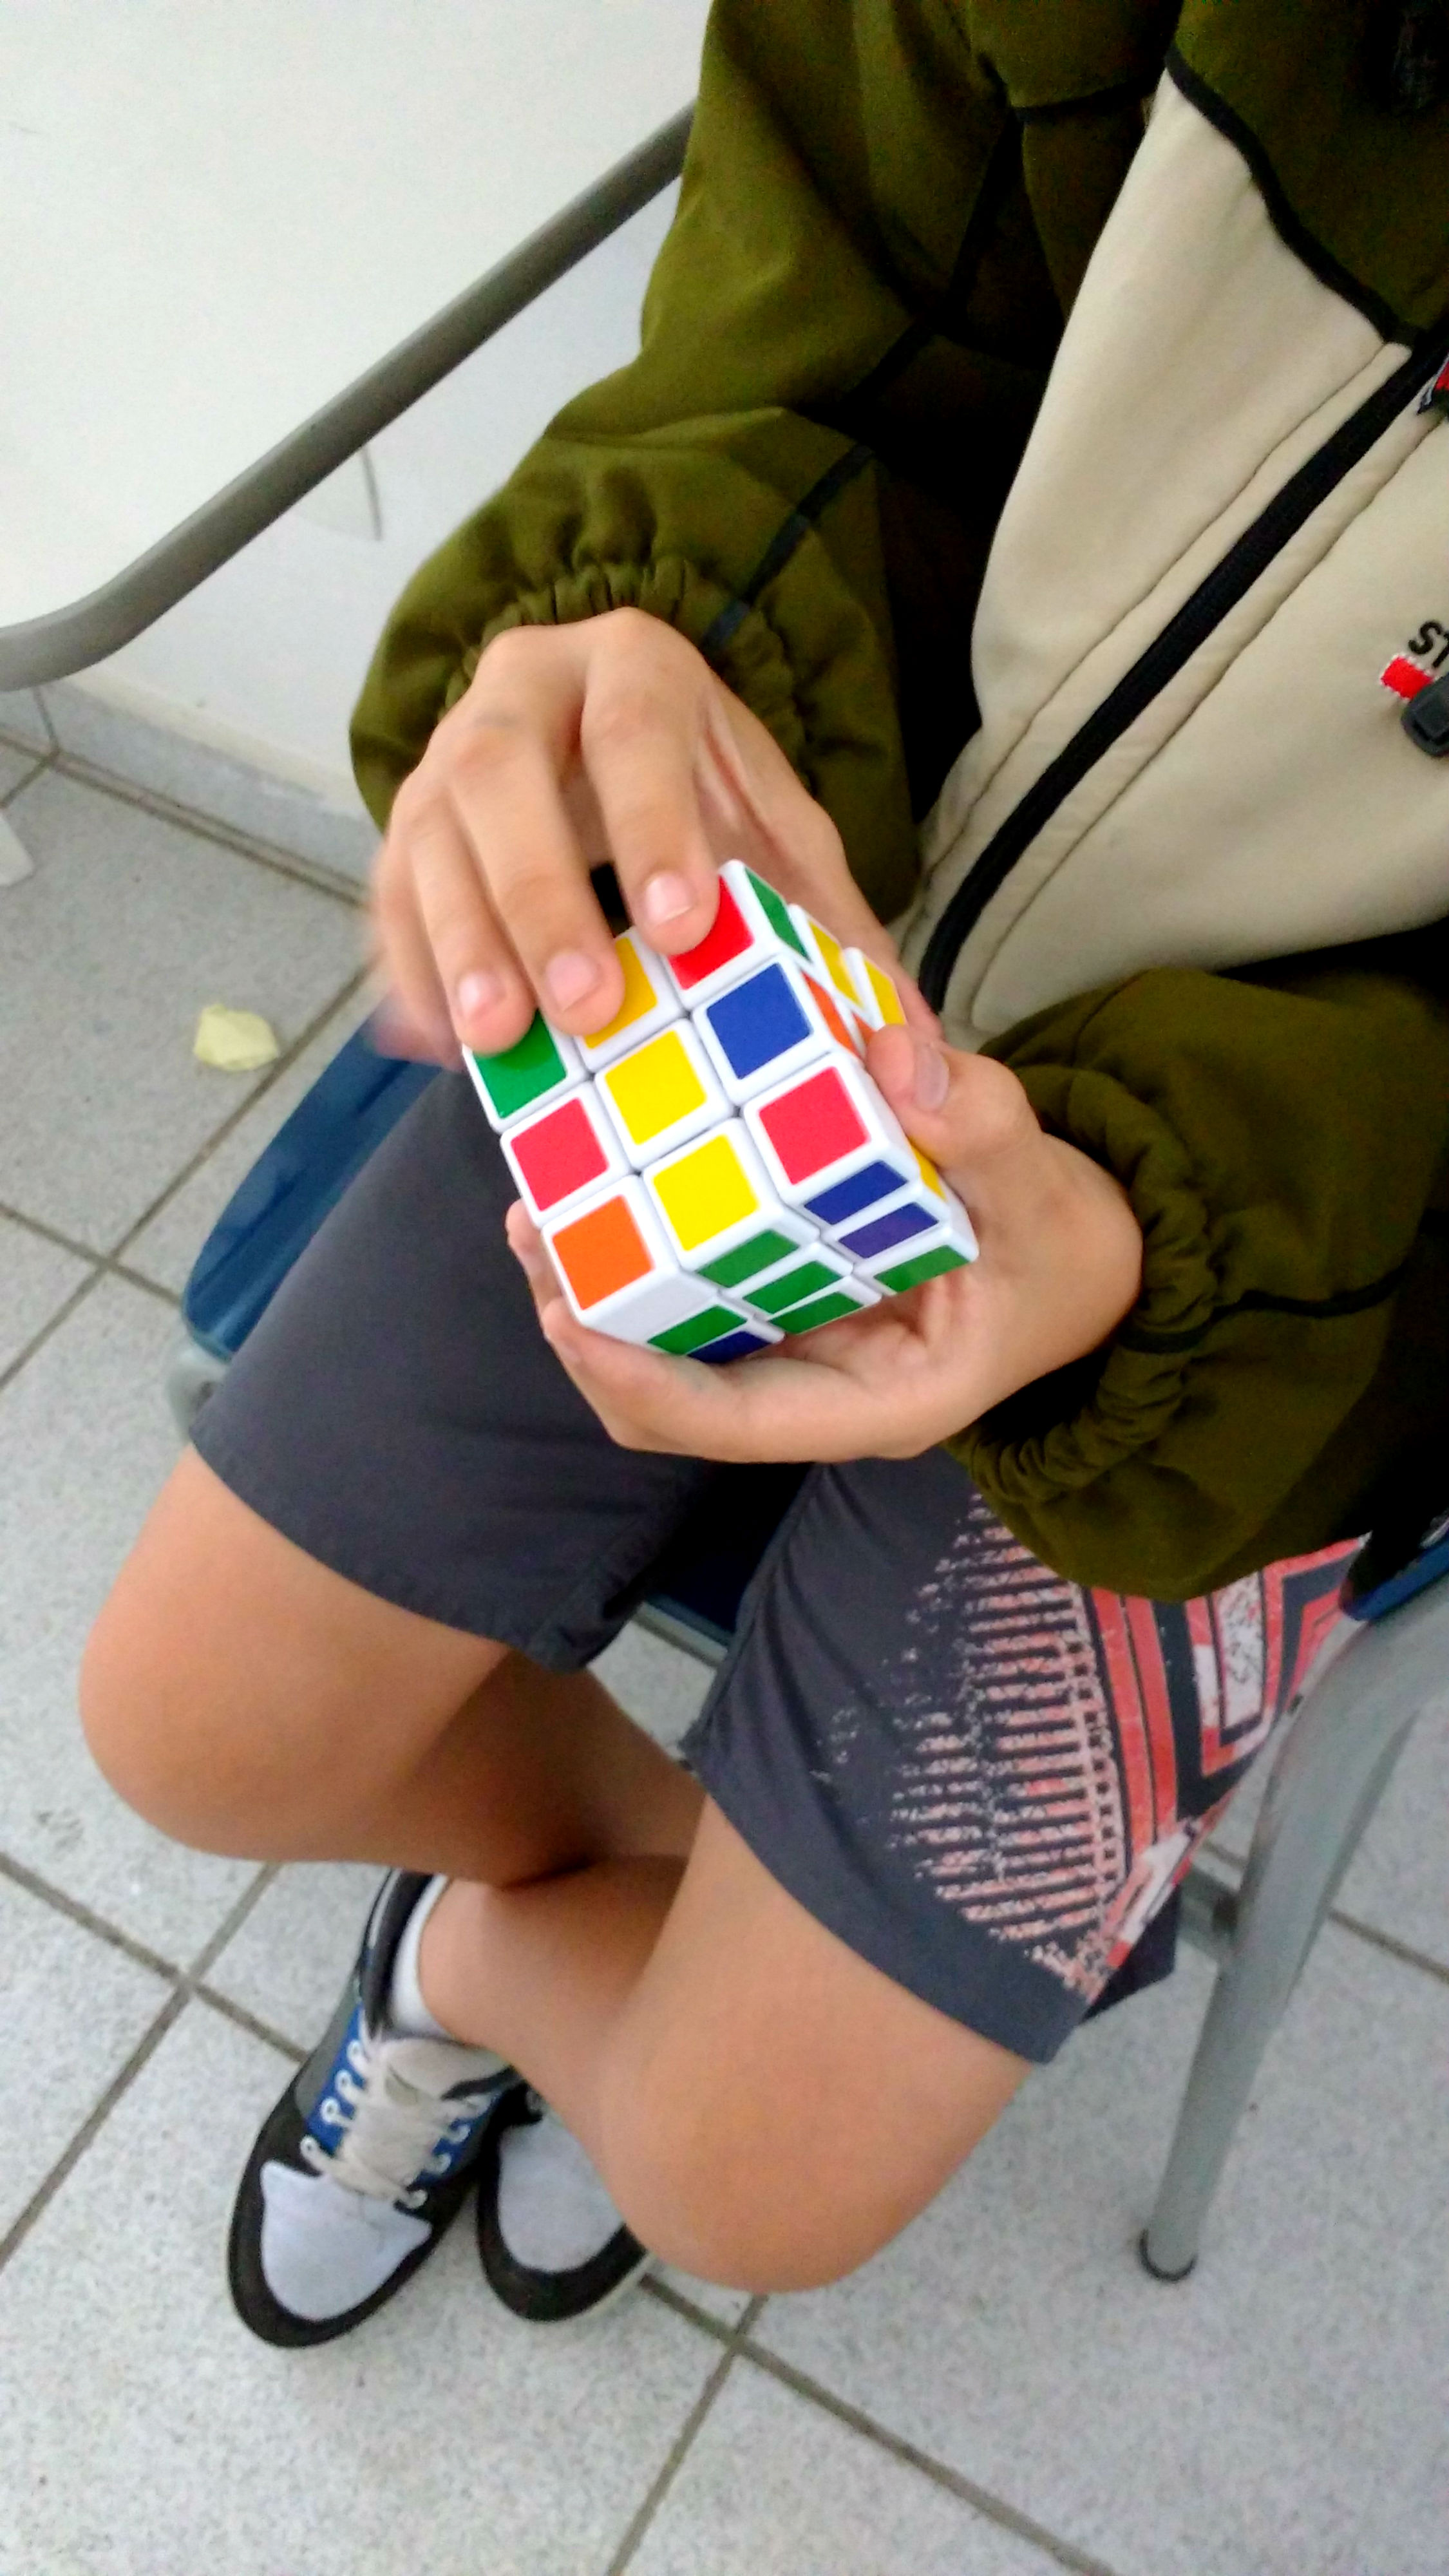 Aprendendo a resolver o cubo mágico